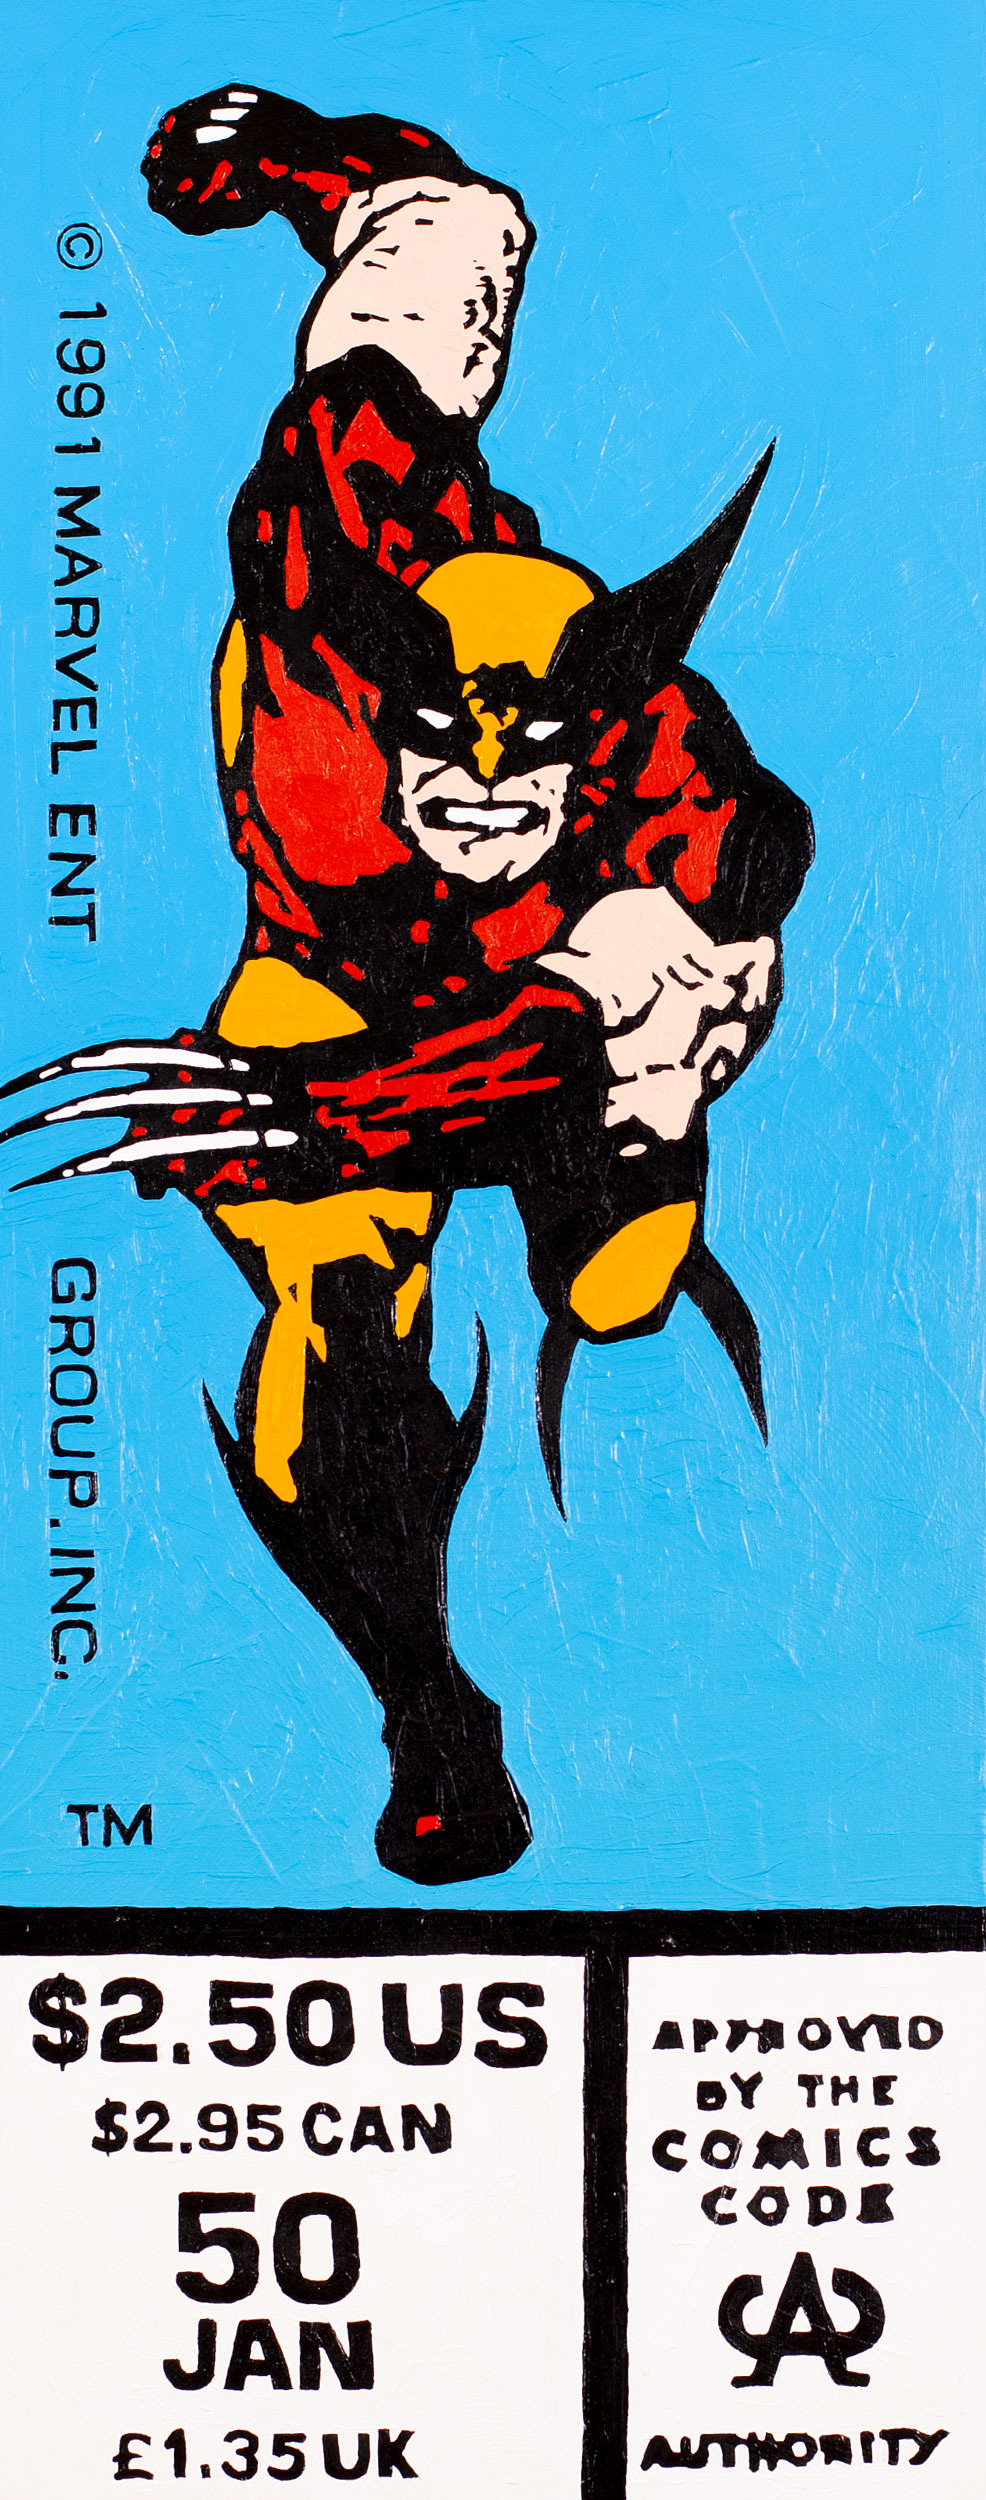 Wolverine50 10x32 toddmonk 2020 web lvgzxf